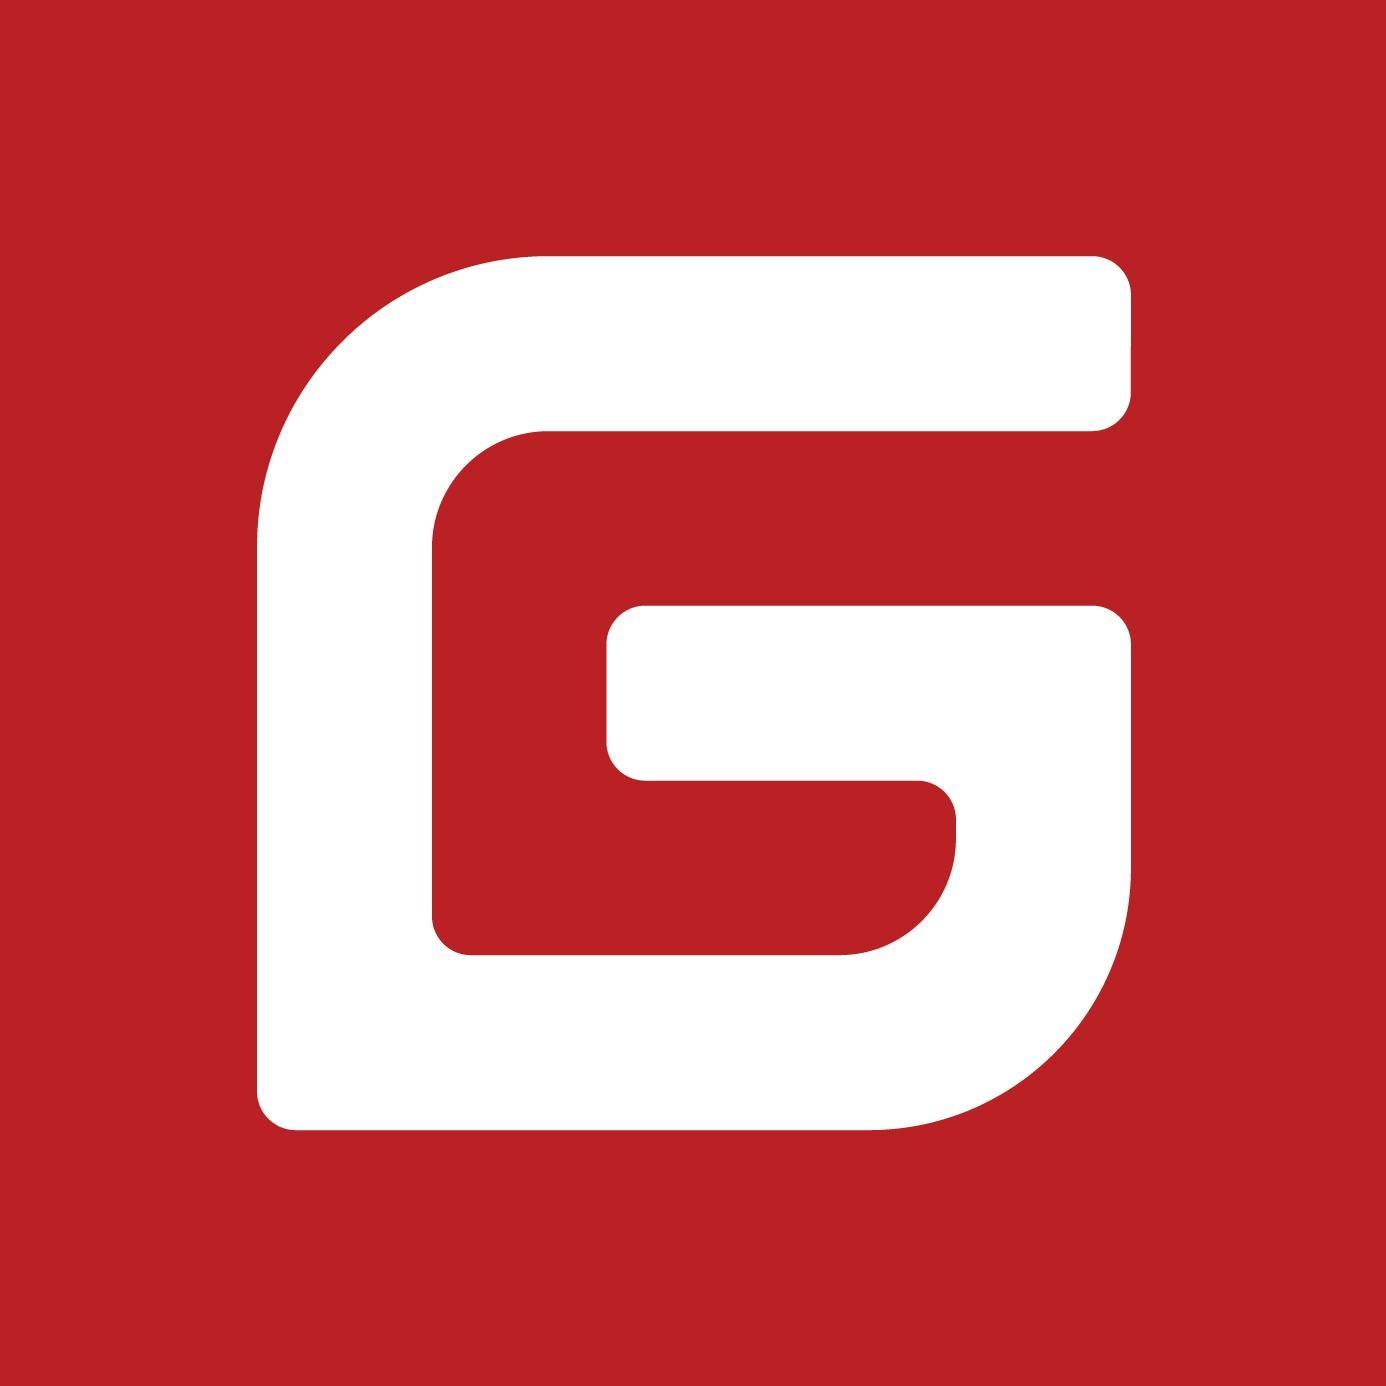 Gitee 上的开源项目